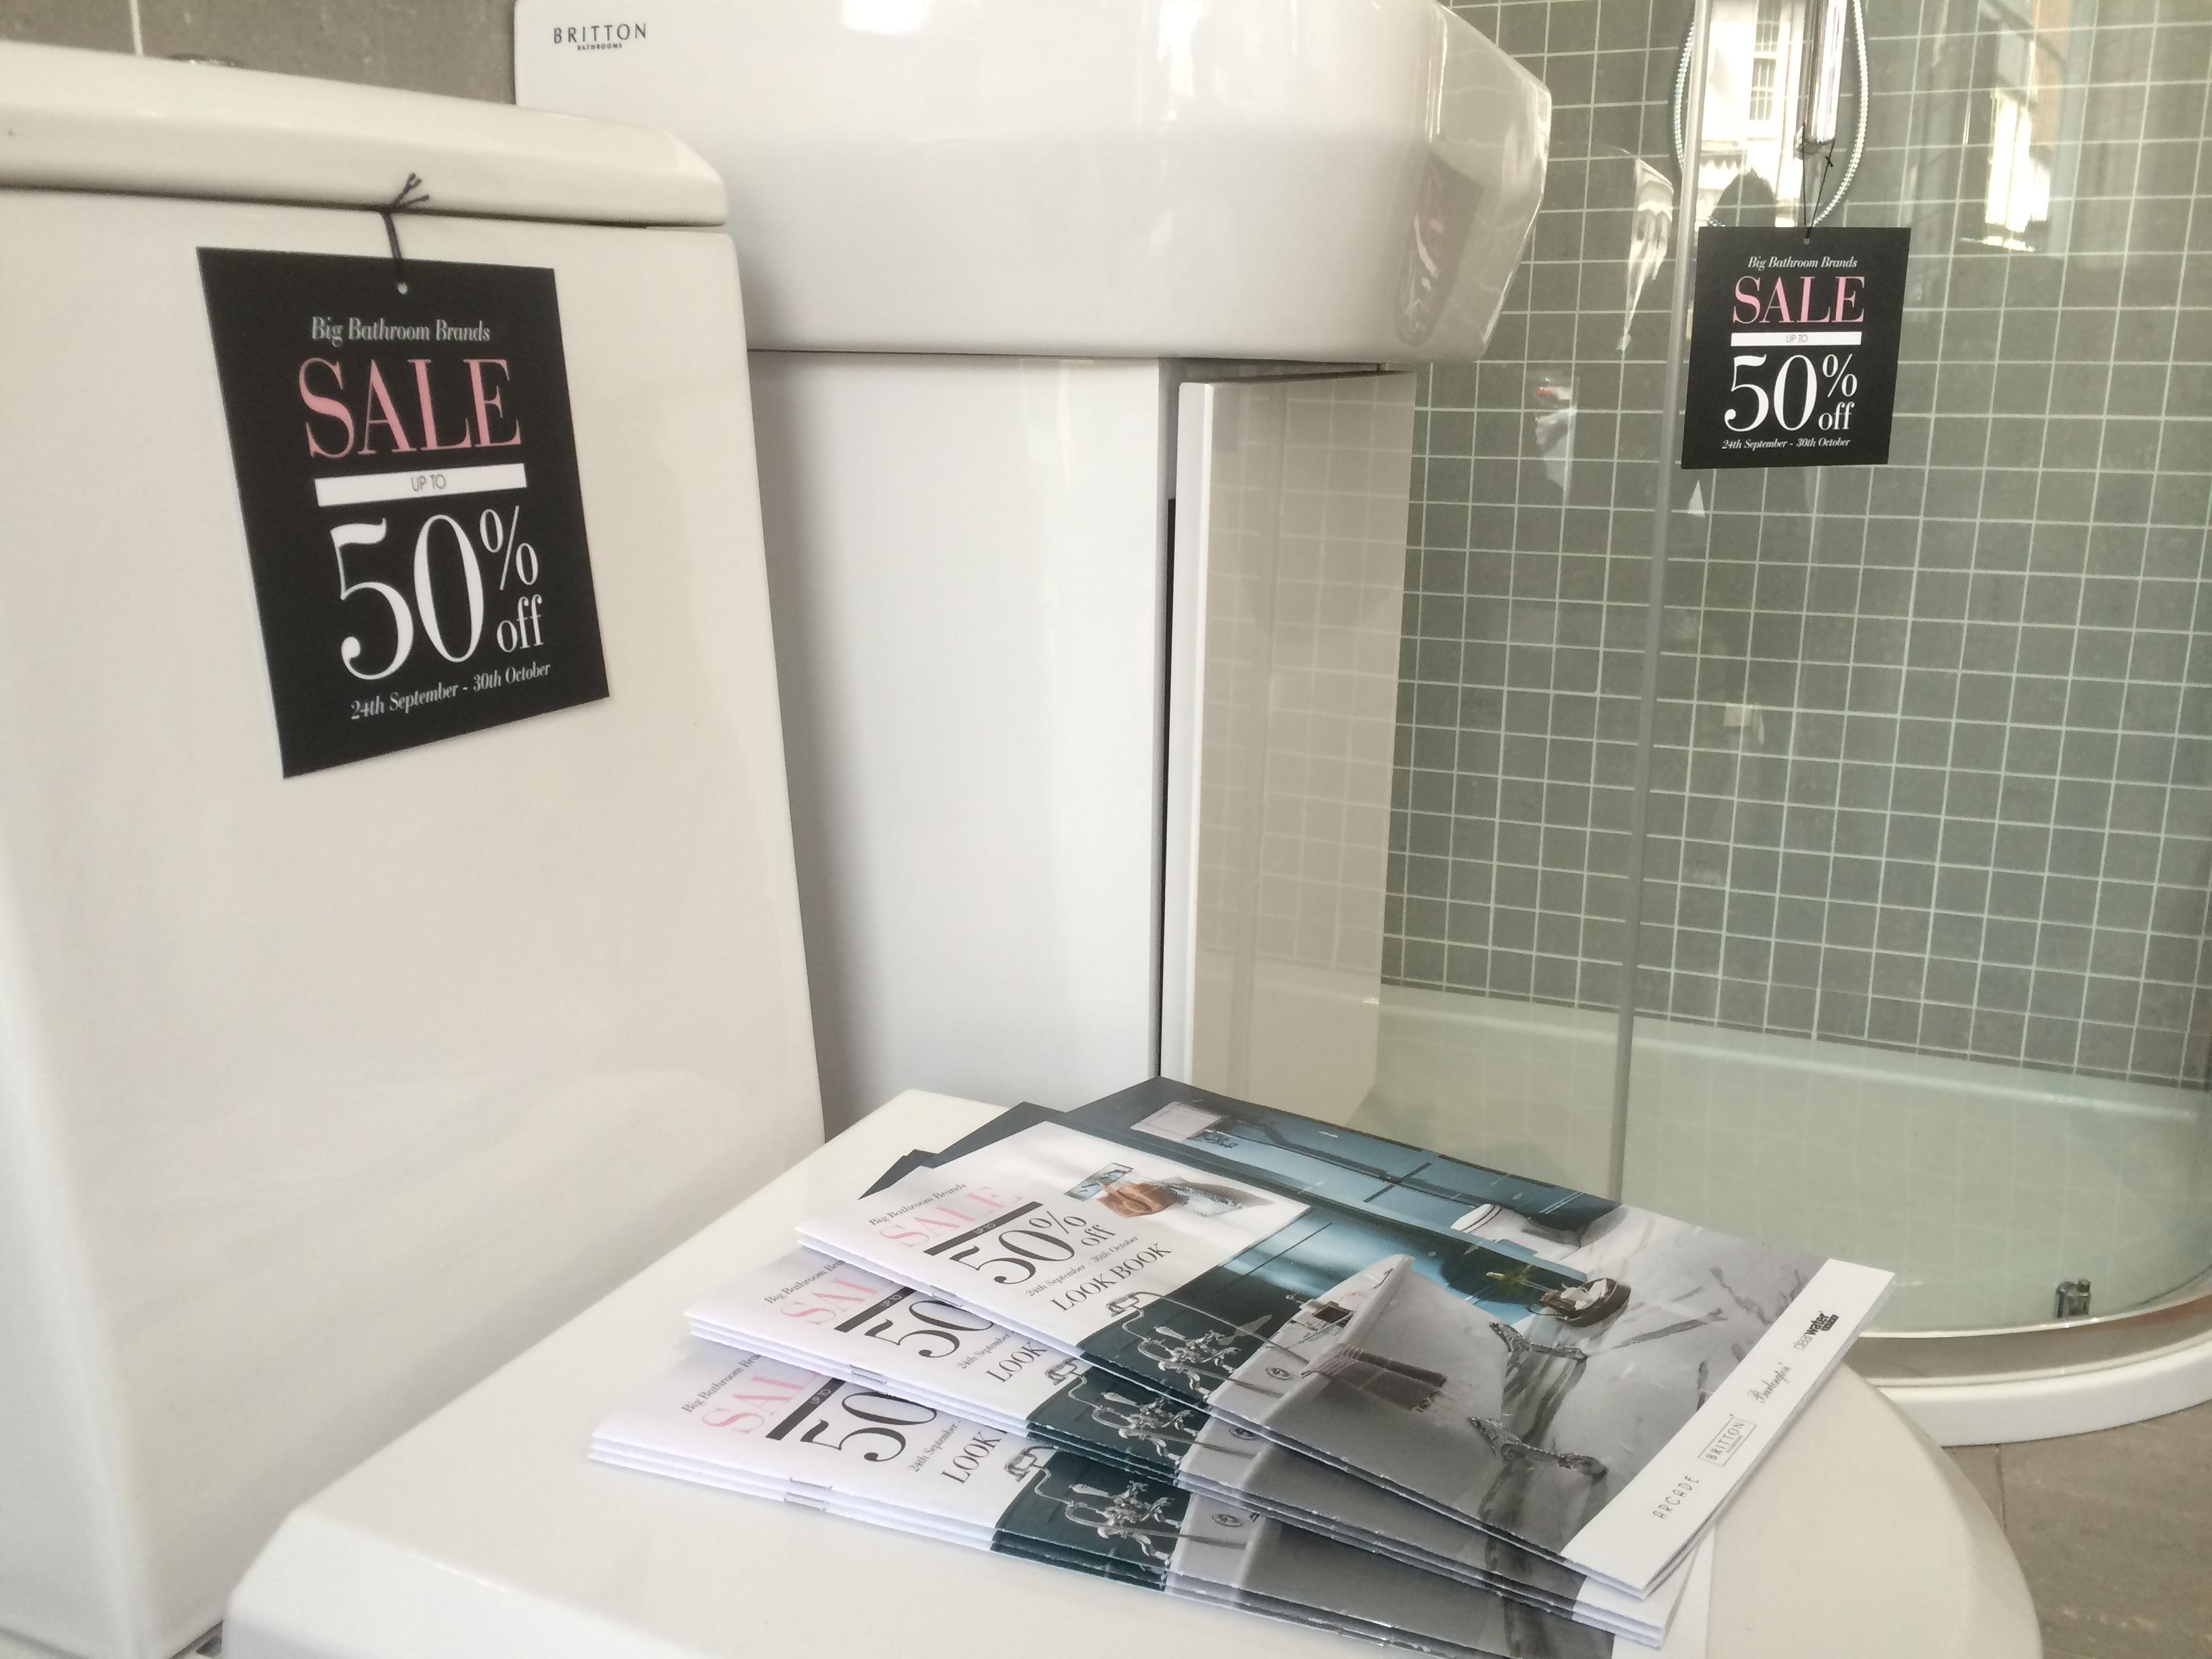 Big Bathroom Brand Sale